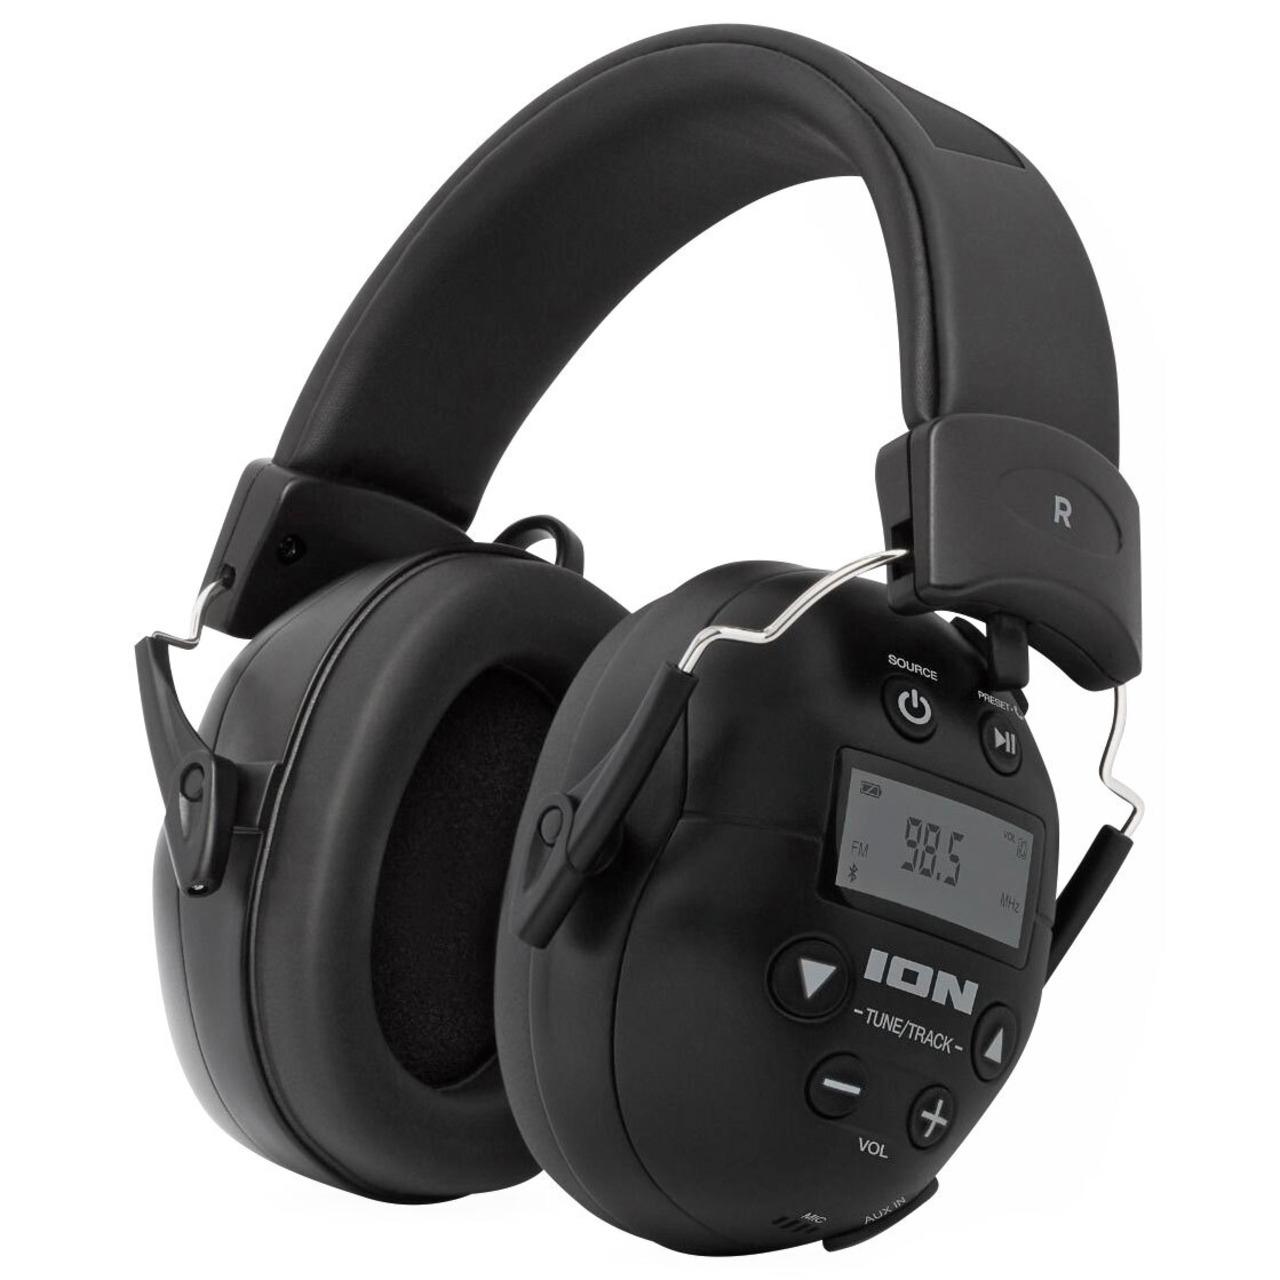 ION Audio Kapselgehörschutz-Kopfhörer ToughSounds 2- Bluetooth- Radio- Akku- 27 dB NRR